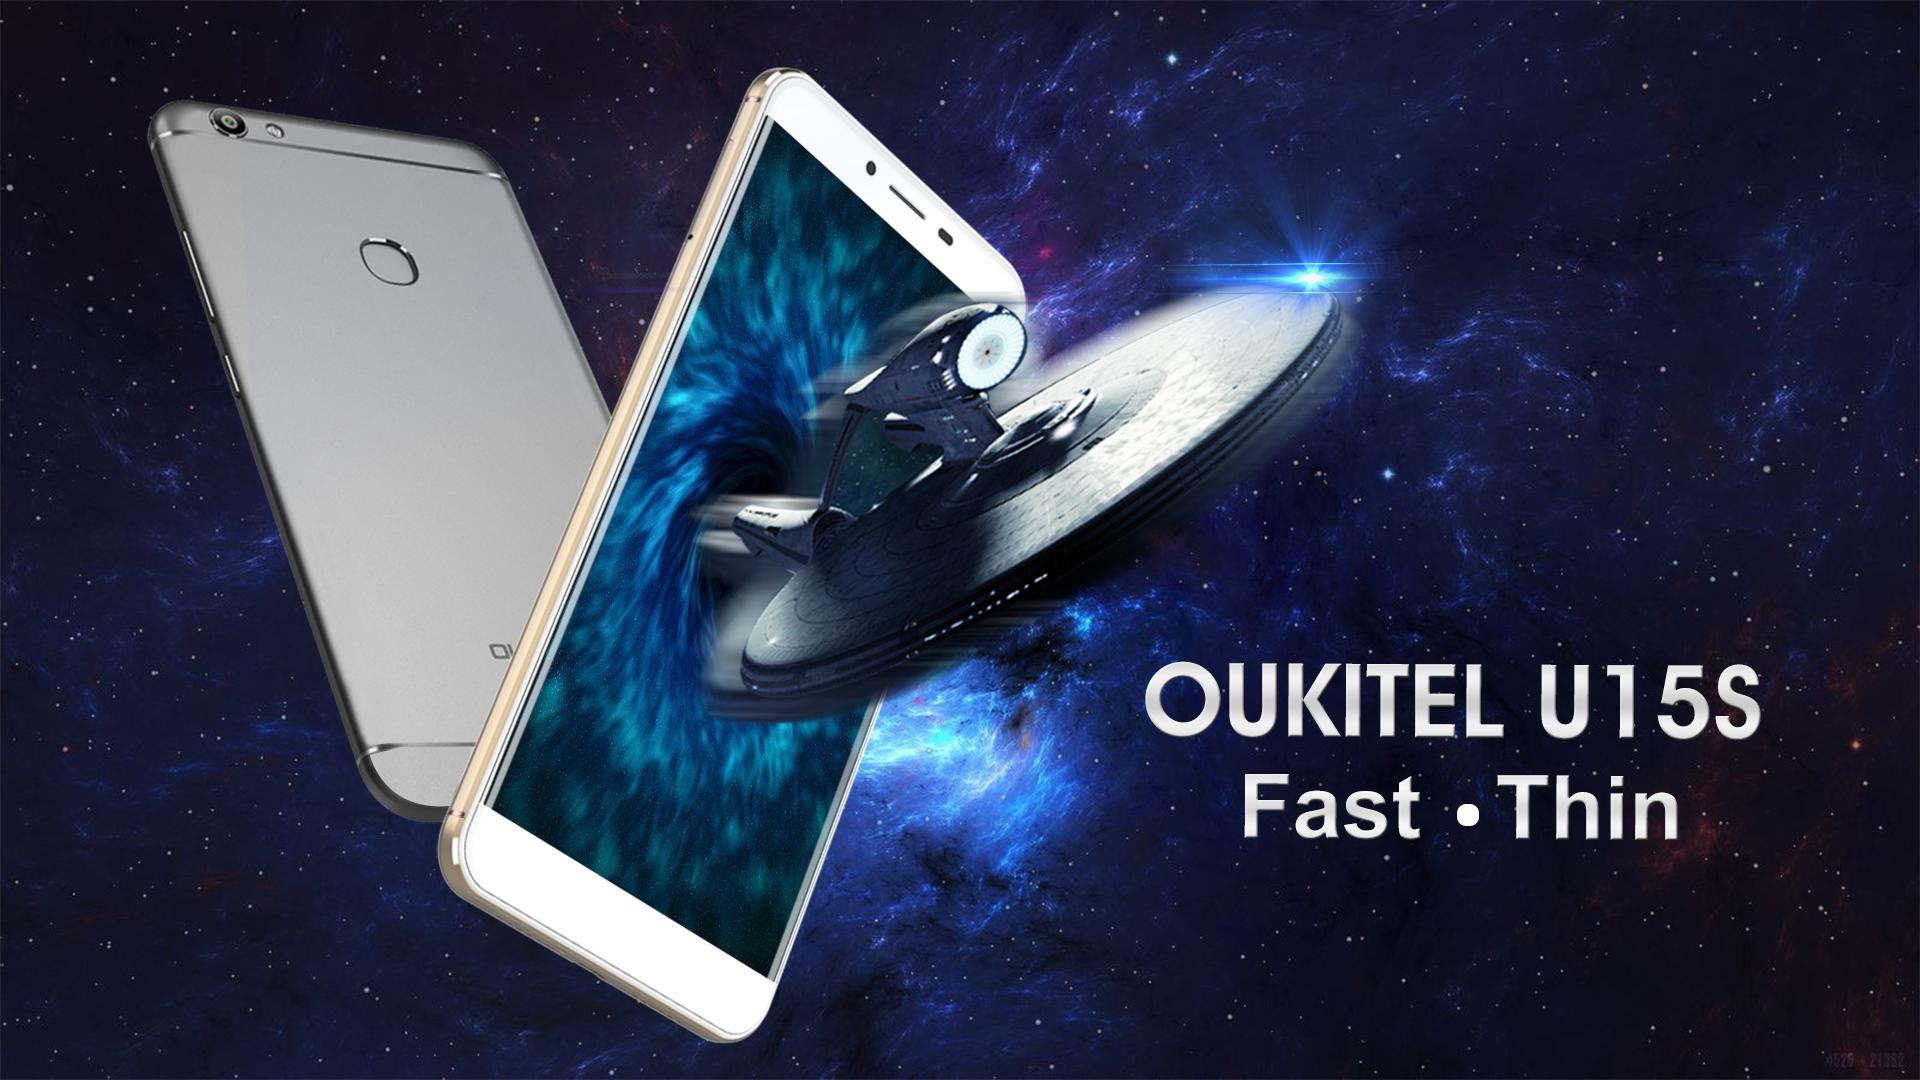 Oukitel spustil prodej nadupaného mobilu U15s [sponzorovaný článek]